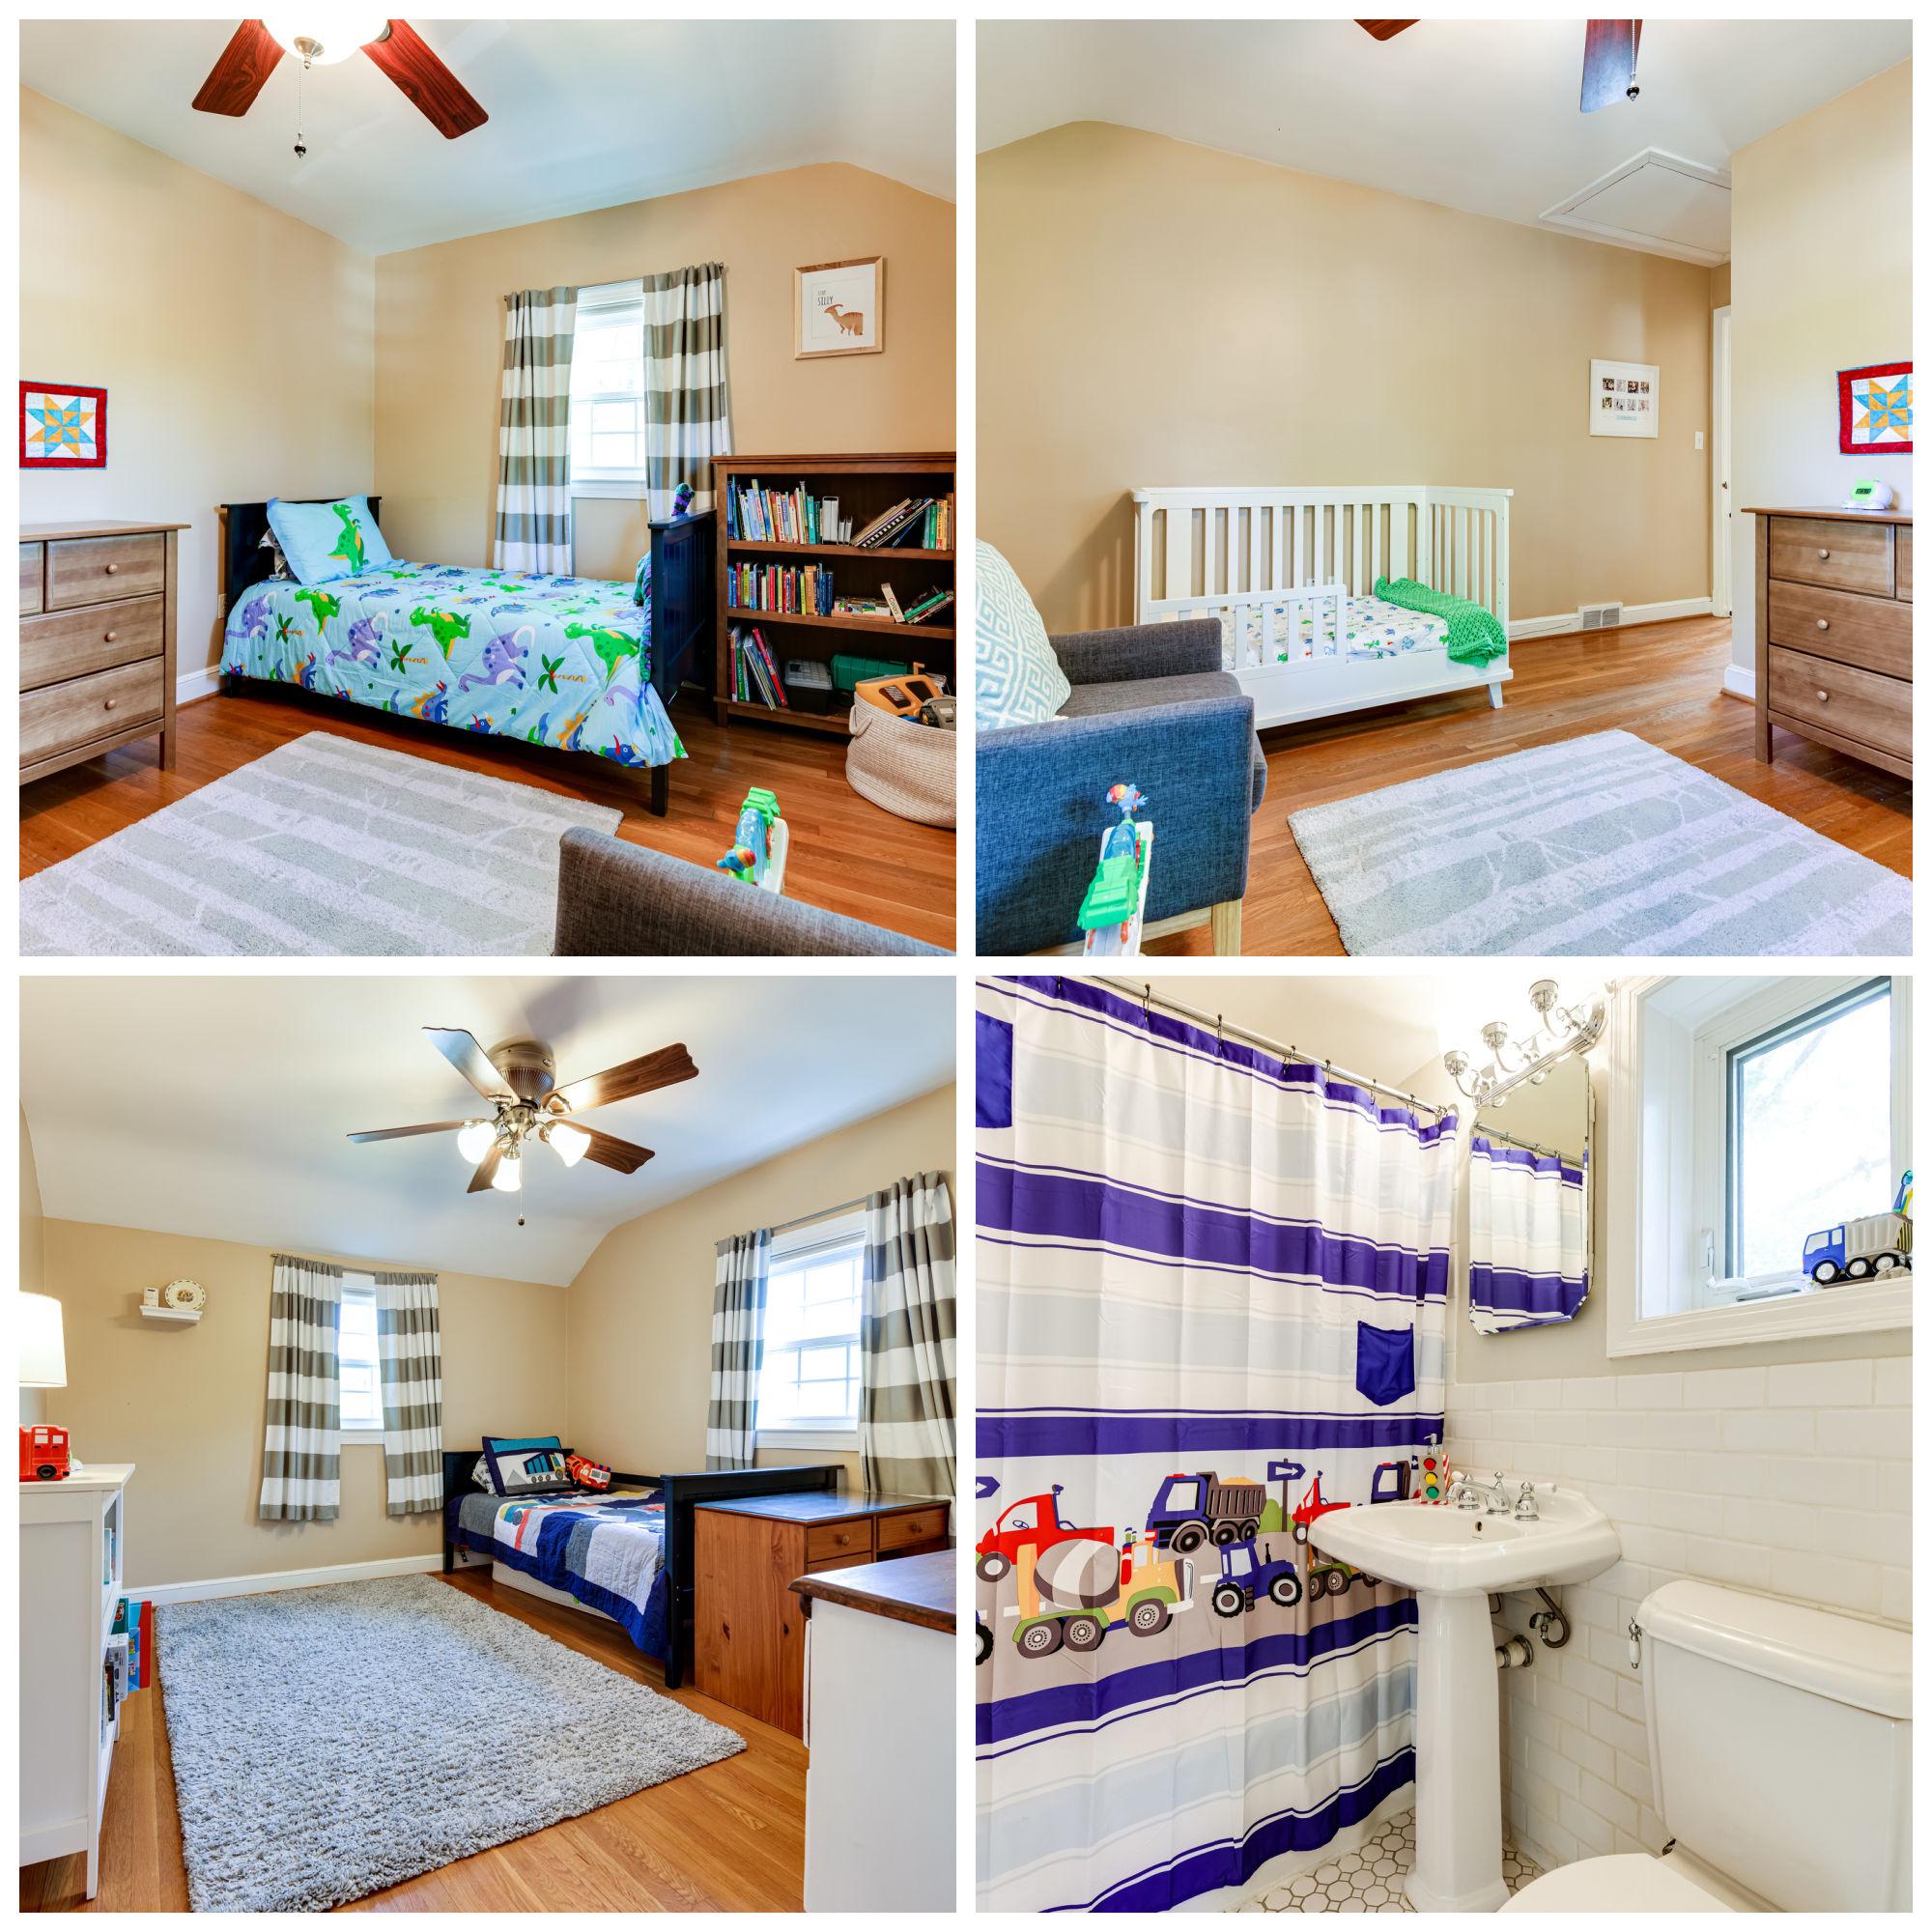 167 N Columbus St, Arlington- Additional Beds and Bath